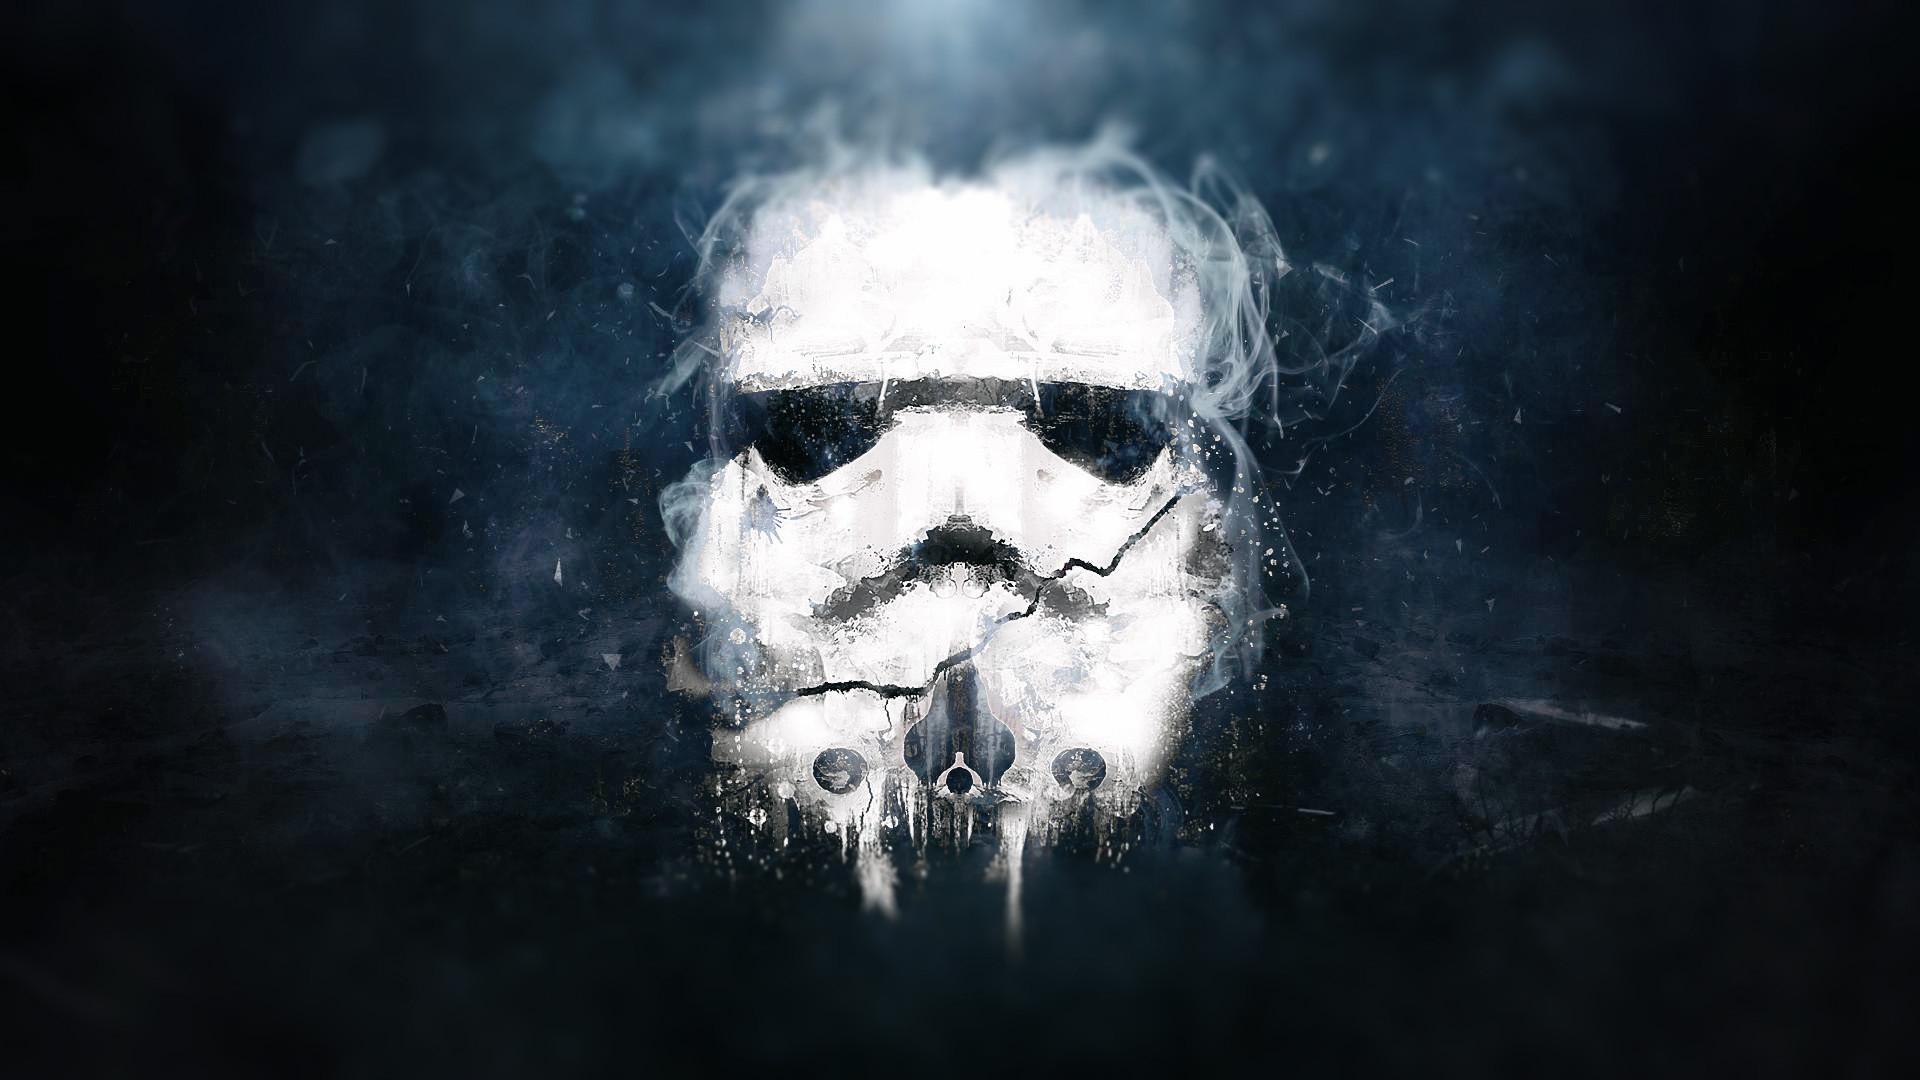 hd stormtrooper wallpaper 66 images